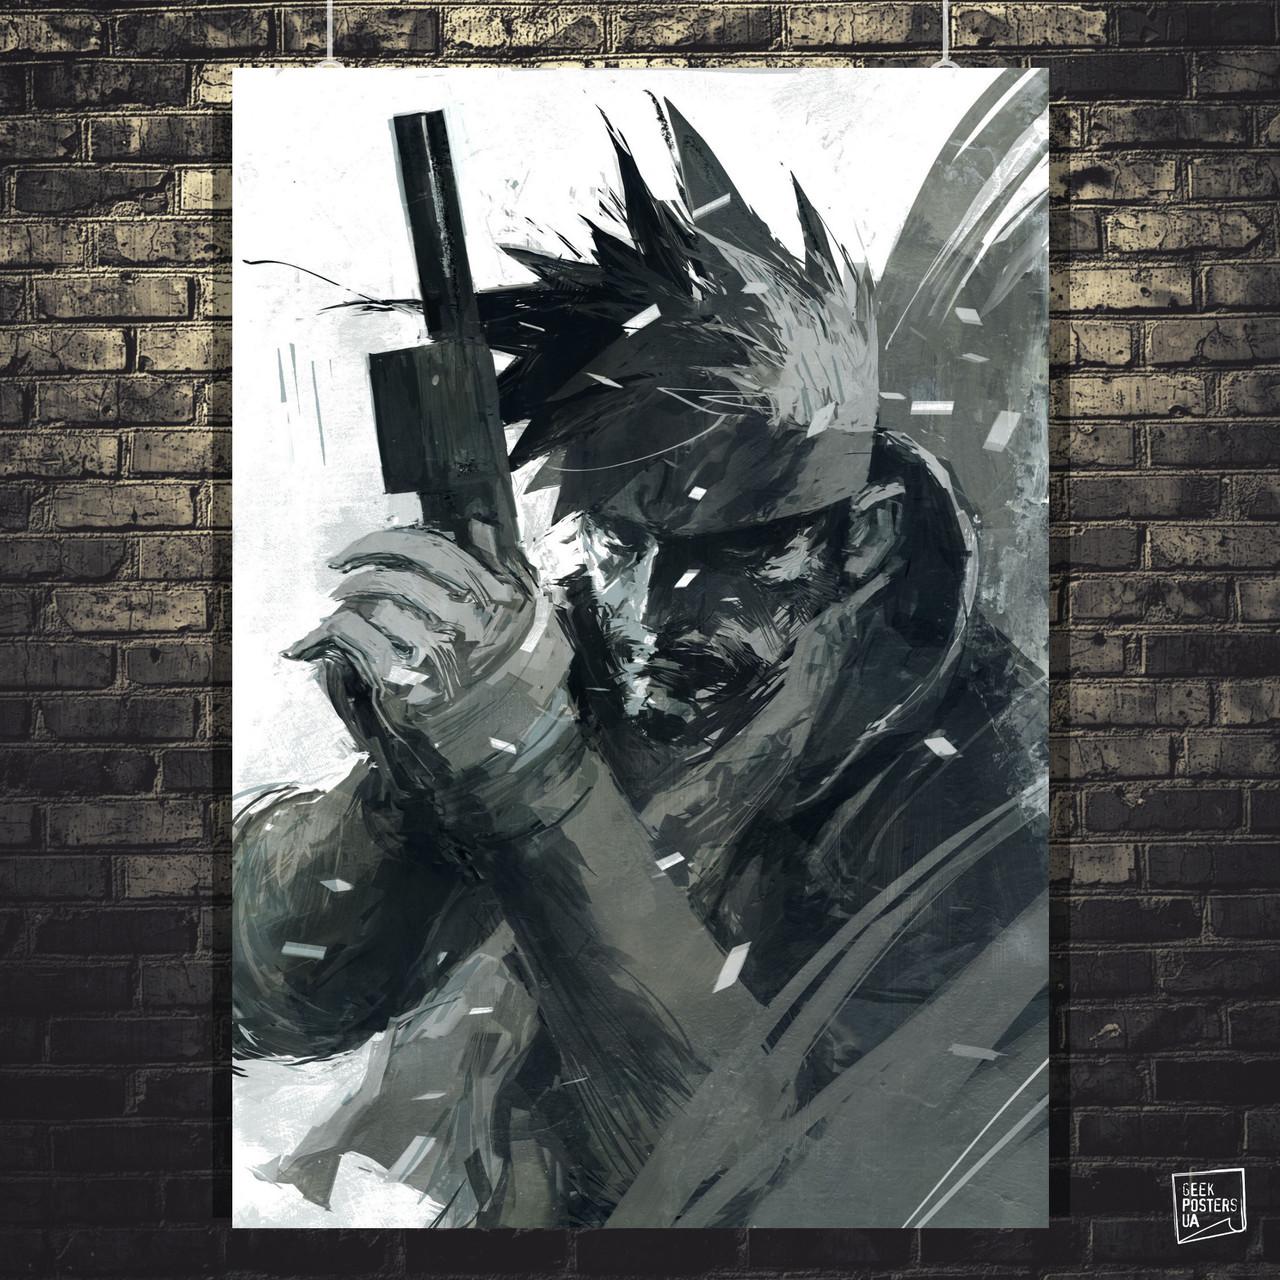 "Постер ""Metal Gear. Солид Снейк (Solid Snake). Минималистичный"". MGS. Размер 60x43см (A2). Глянцевая бумага"